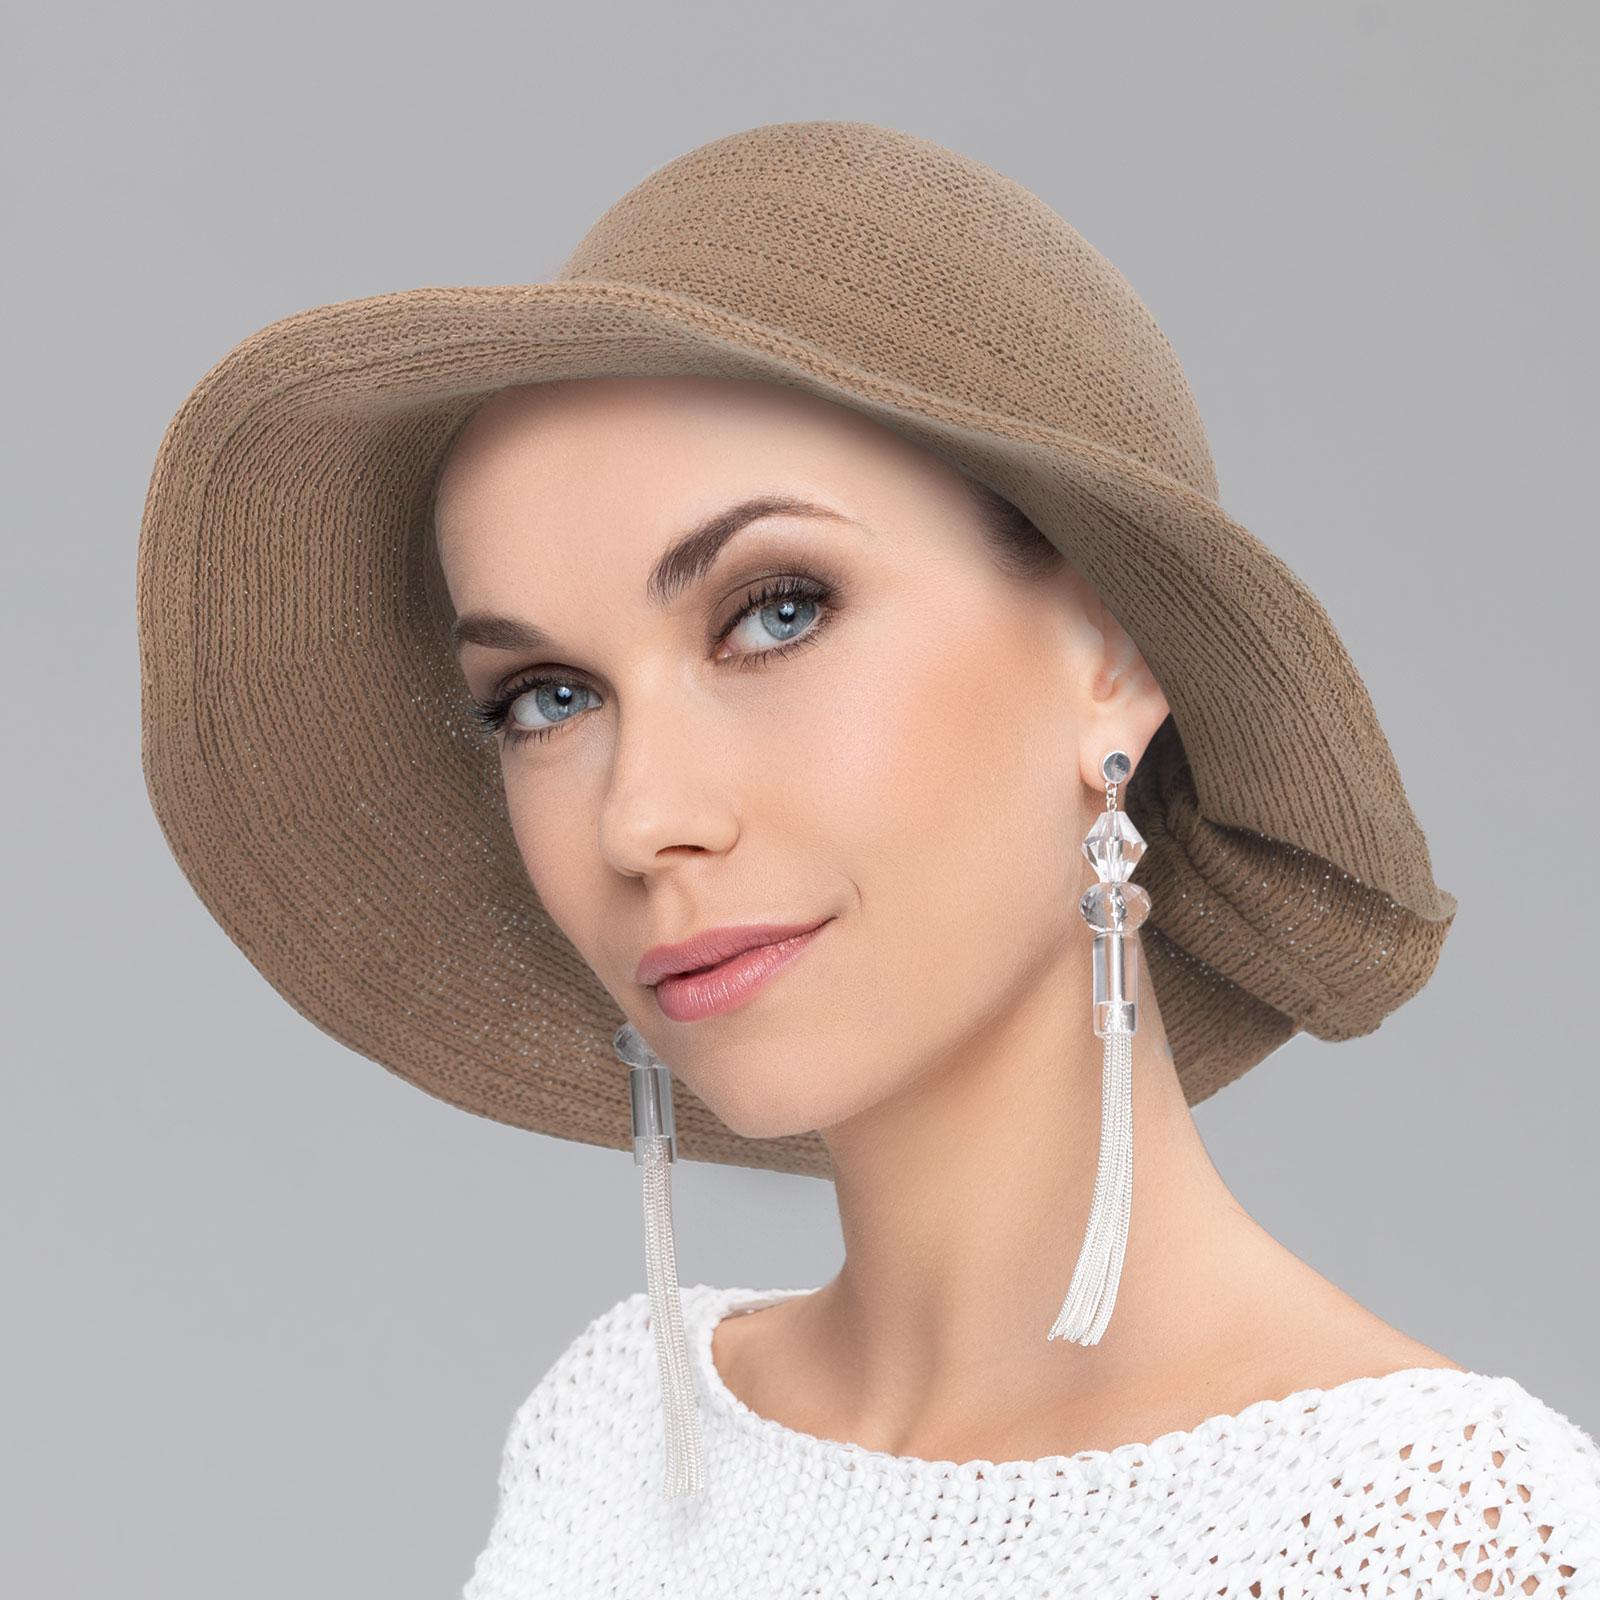 ellens headwear - capana